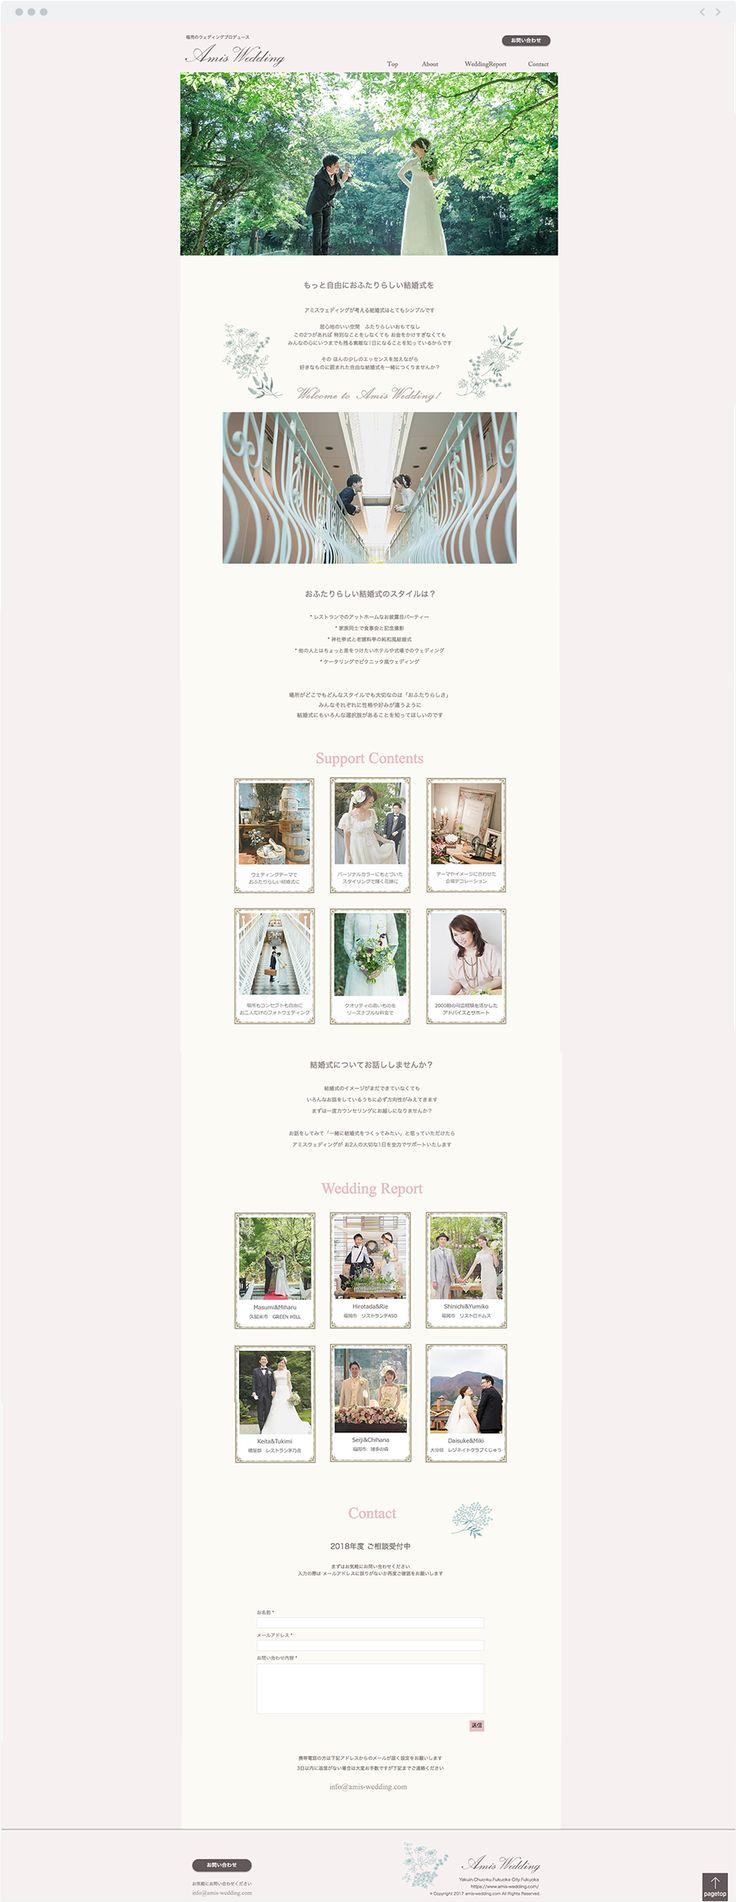 Amis Wedding | Wedding Planner